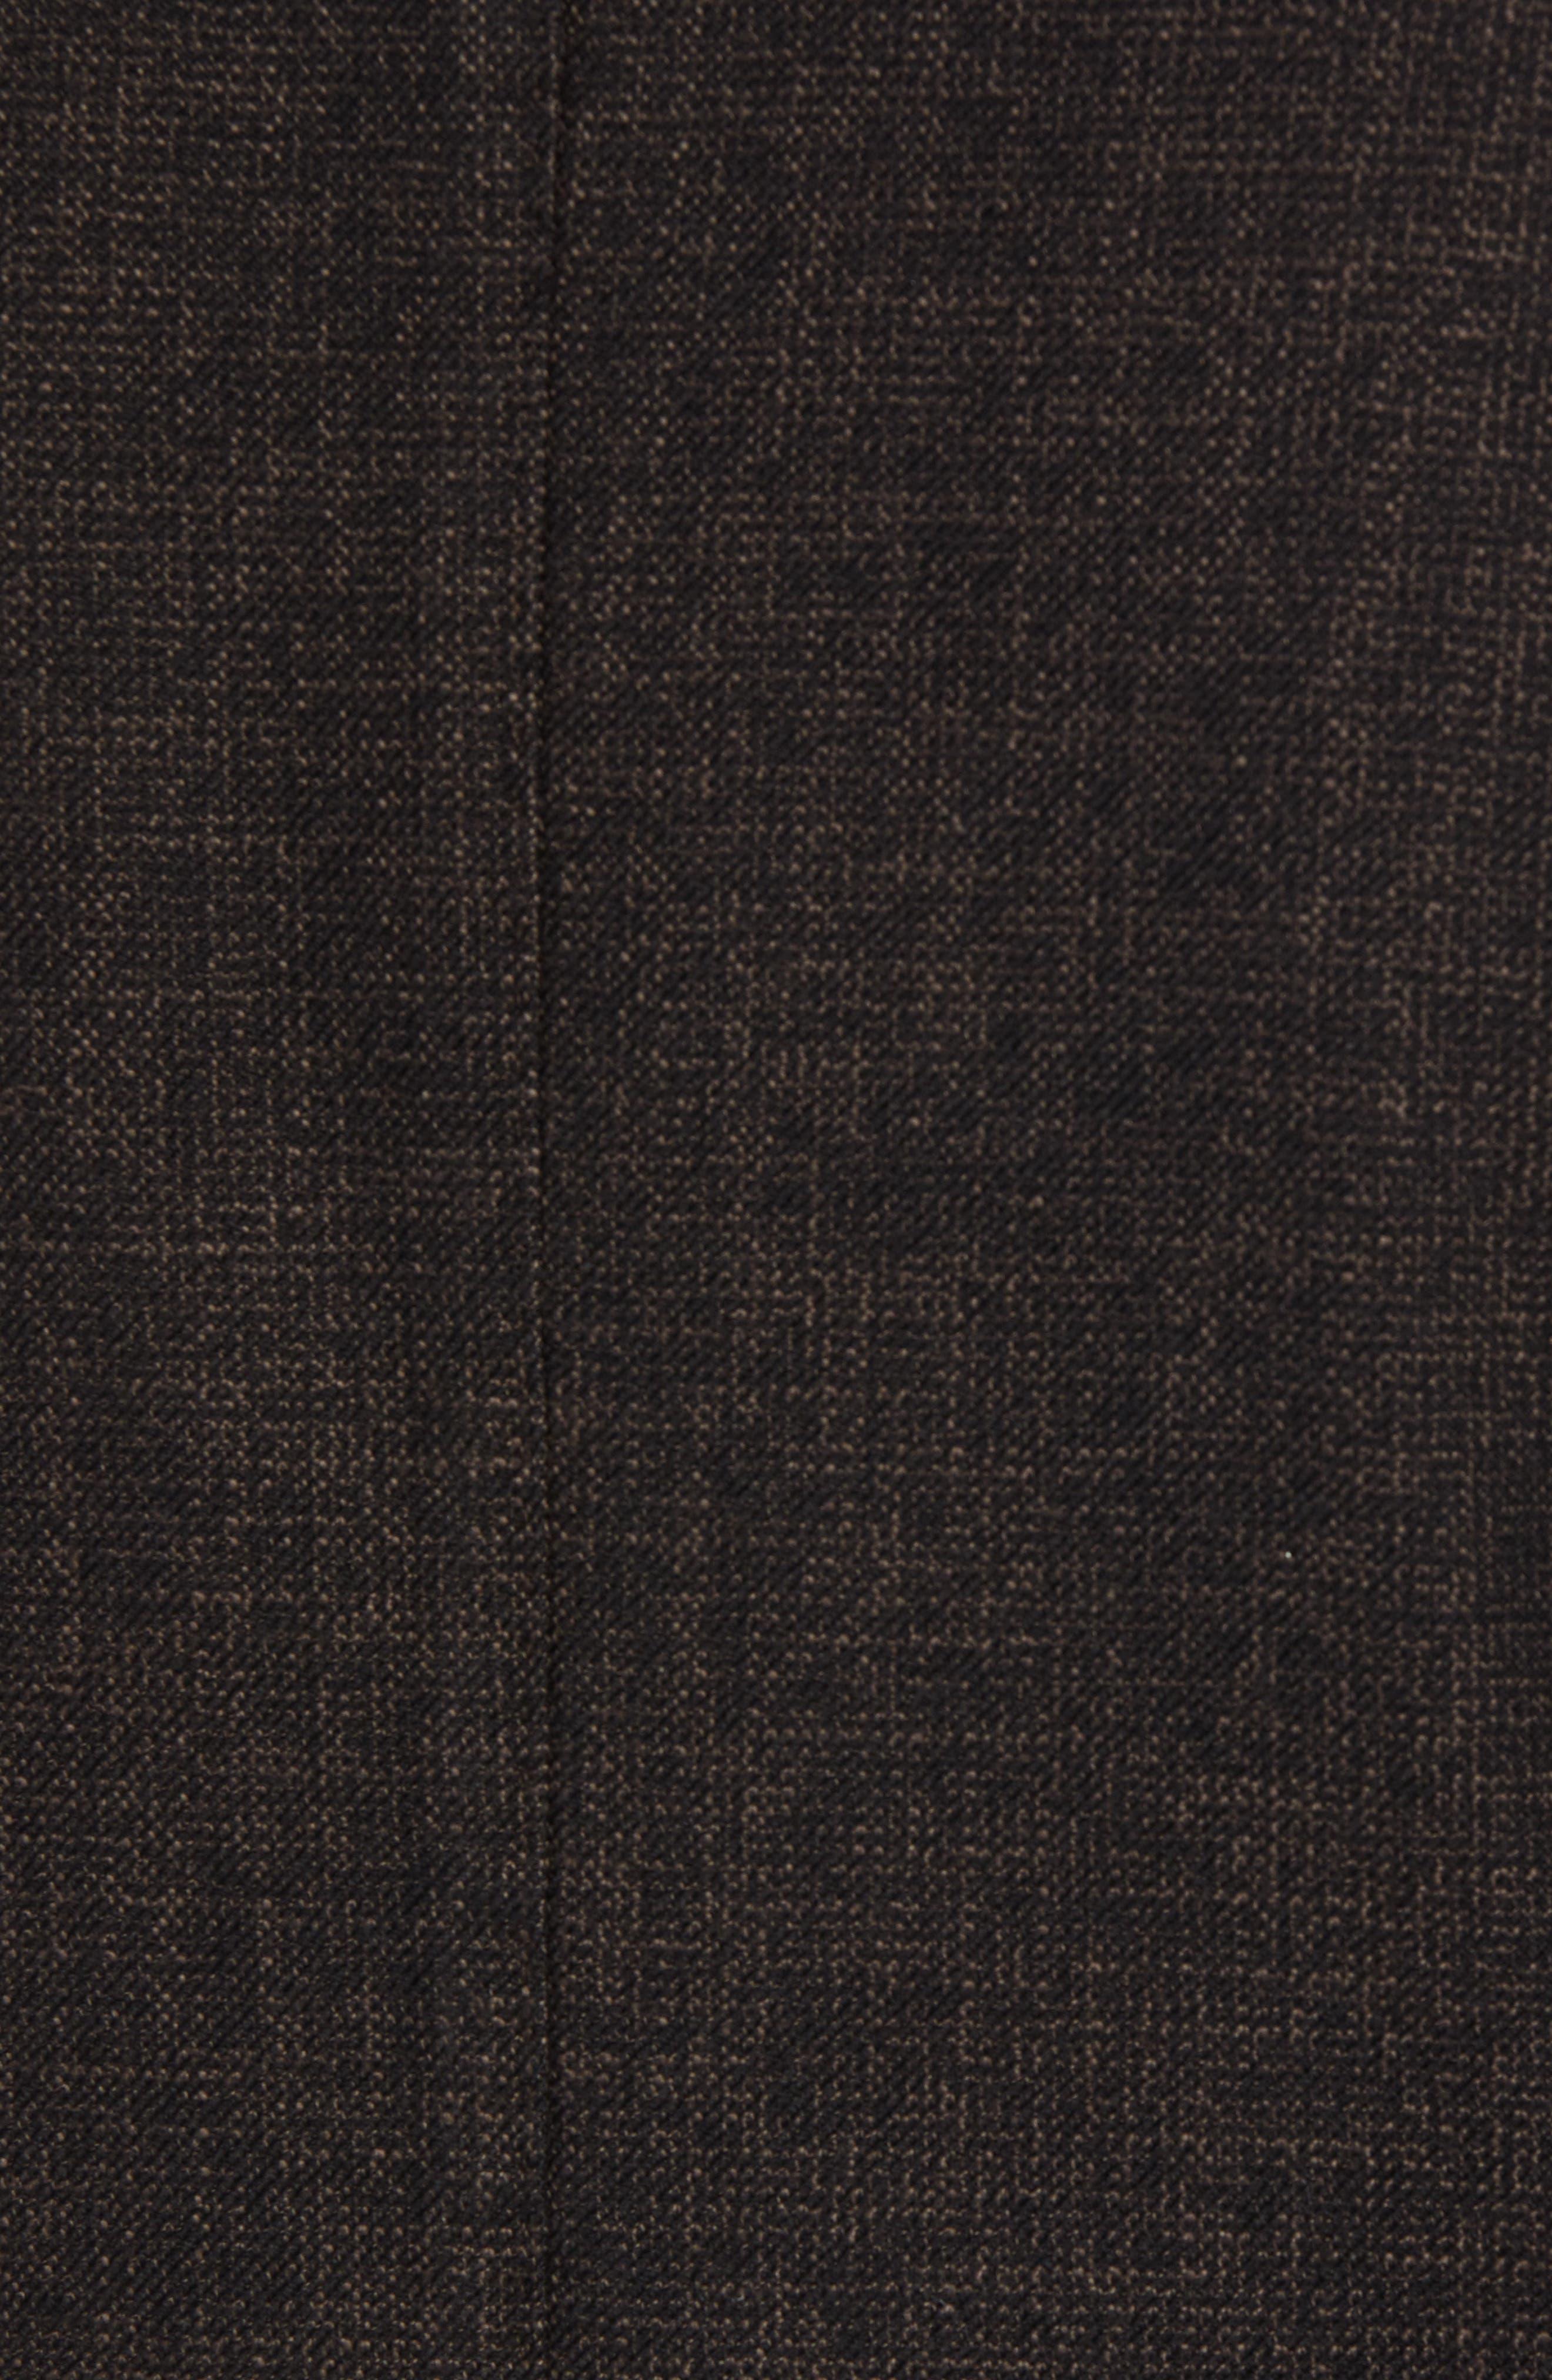 L.B.M 1911 Classic Fit Cotton & Wool Blazer,                             Alternate thumbnail 6, color,                             BROWN